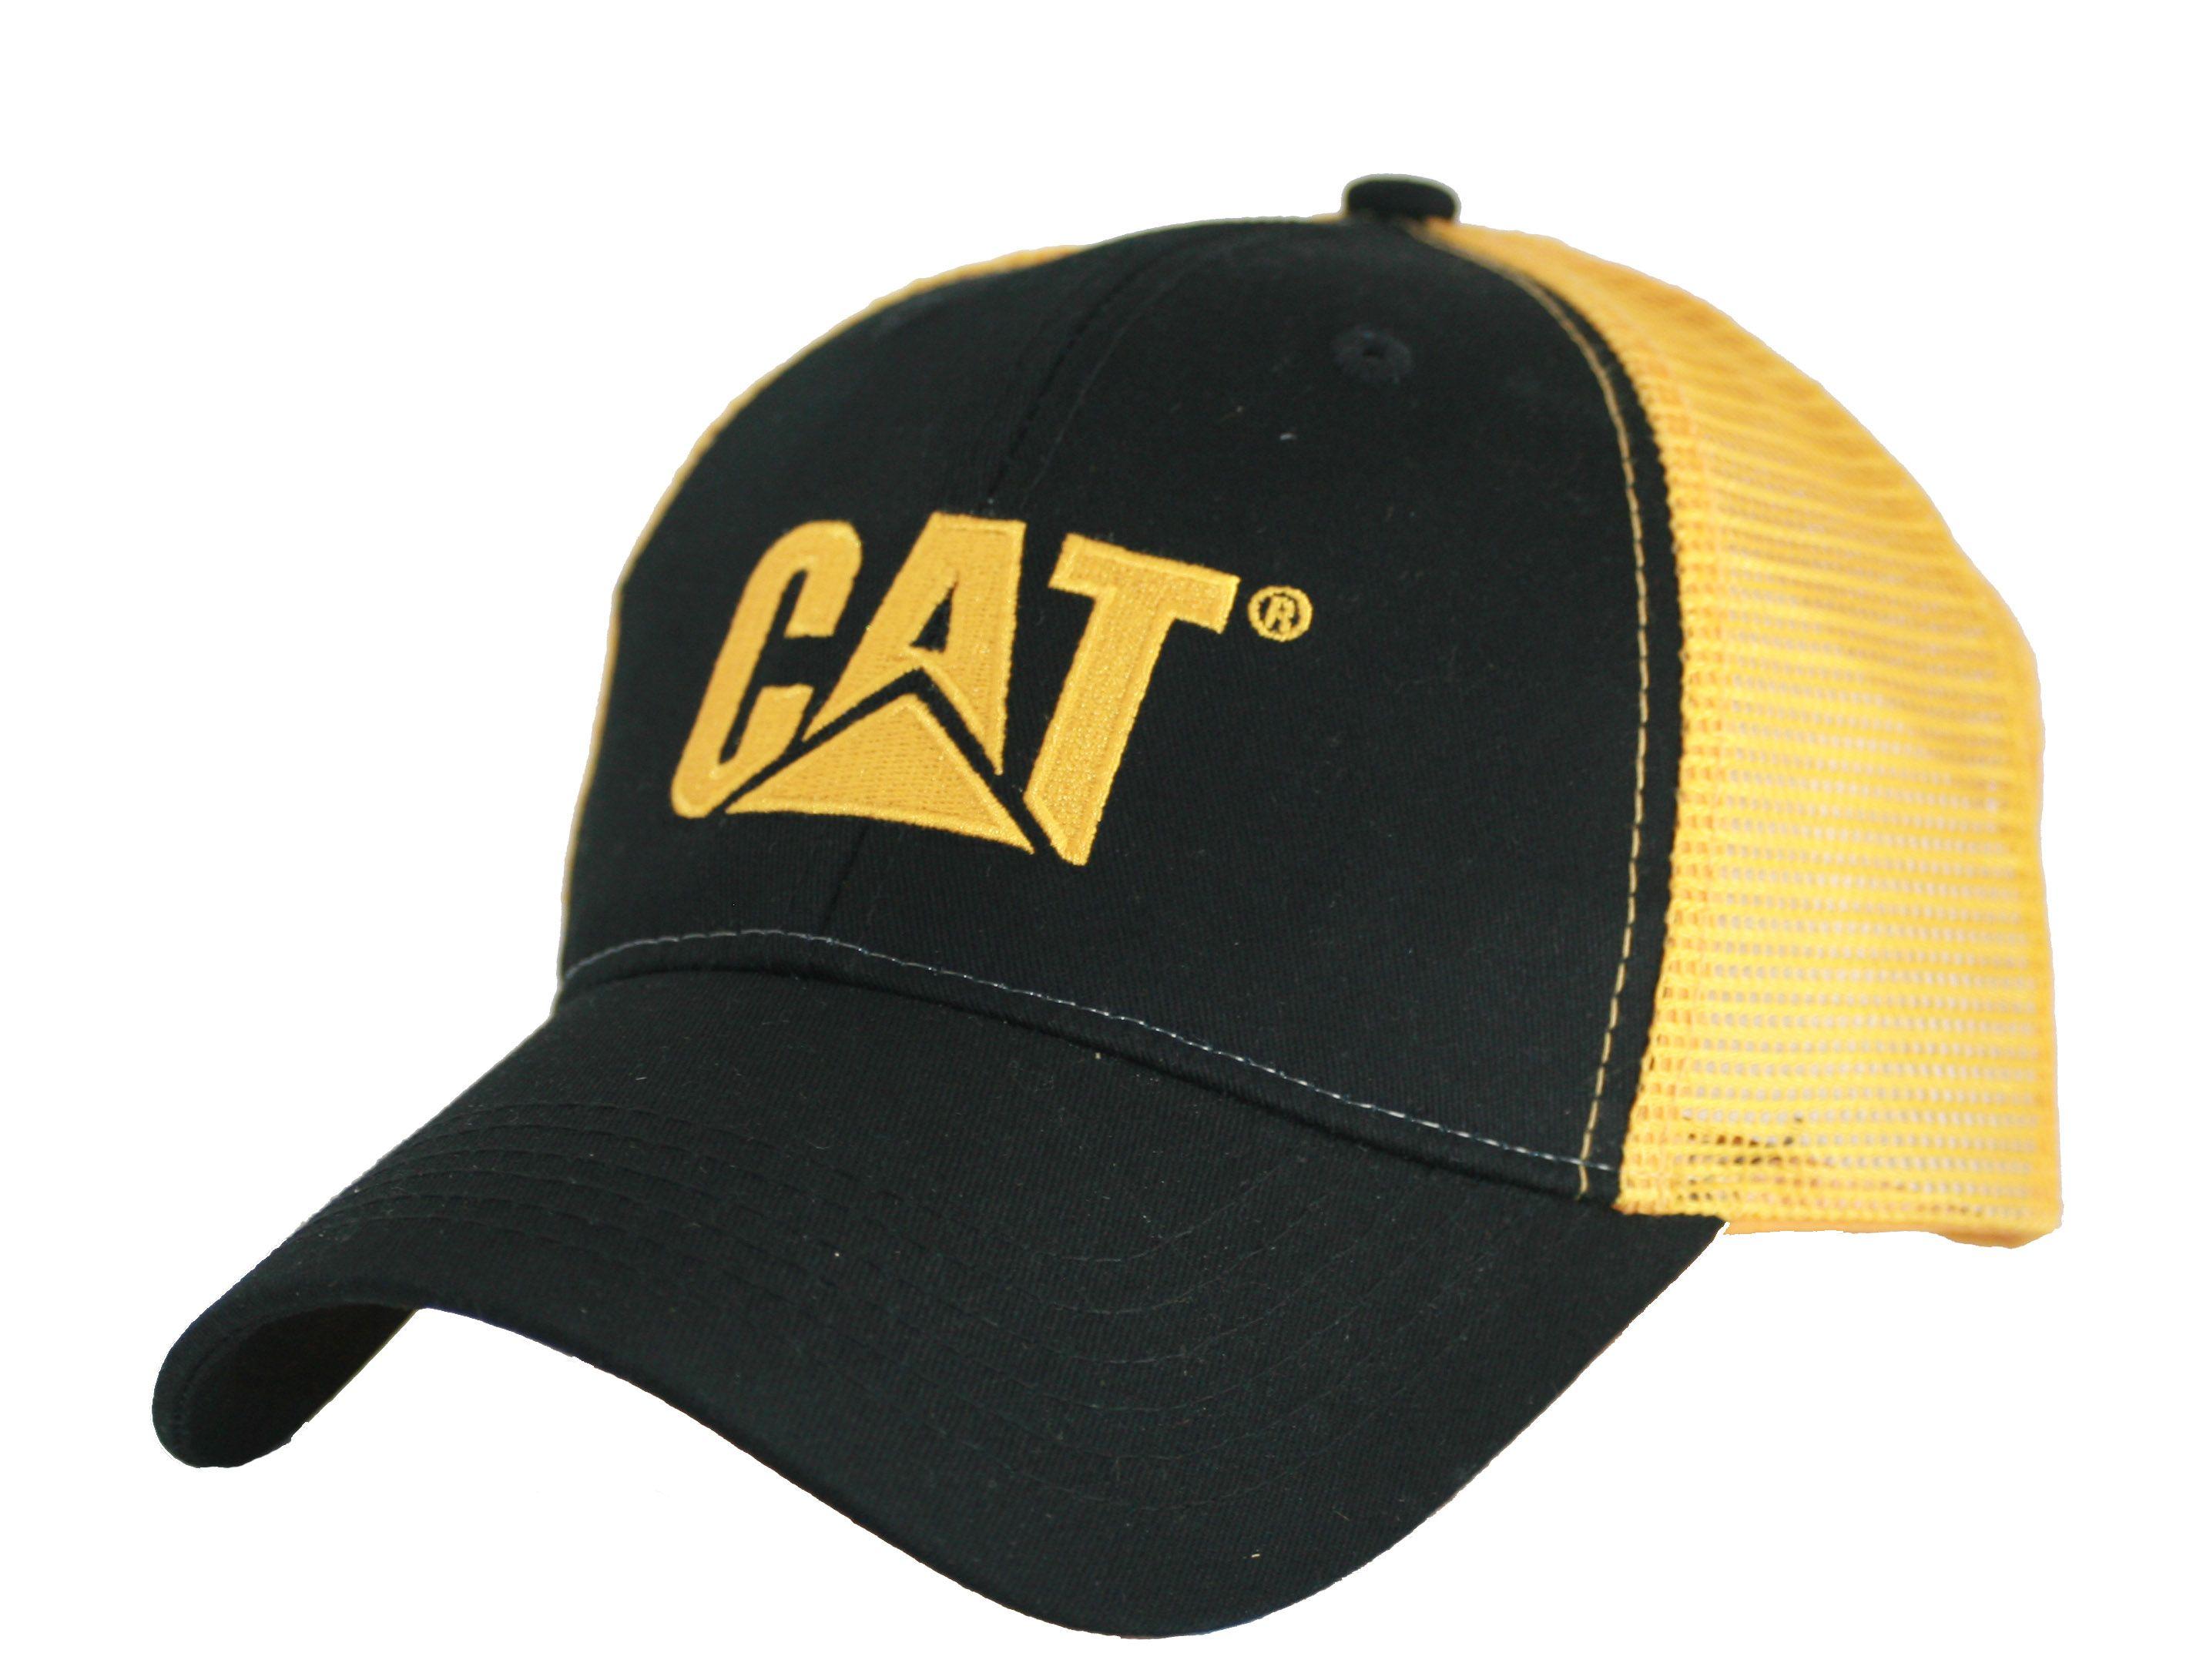 7767e2d0843 Caterpillar Merchandise - CAT Merchandise - CAT Caps - Caterpillar CAT  Black   Gold Cap